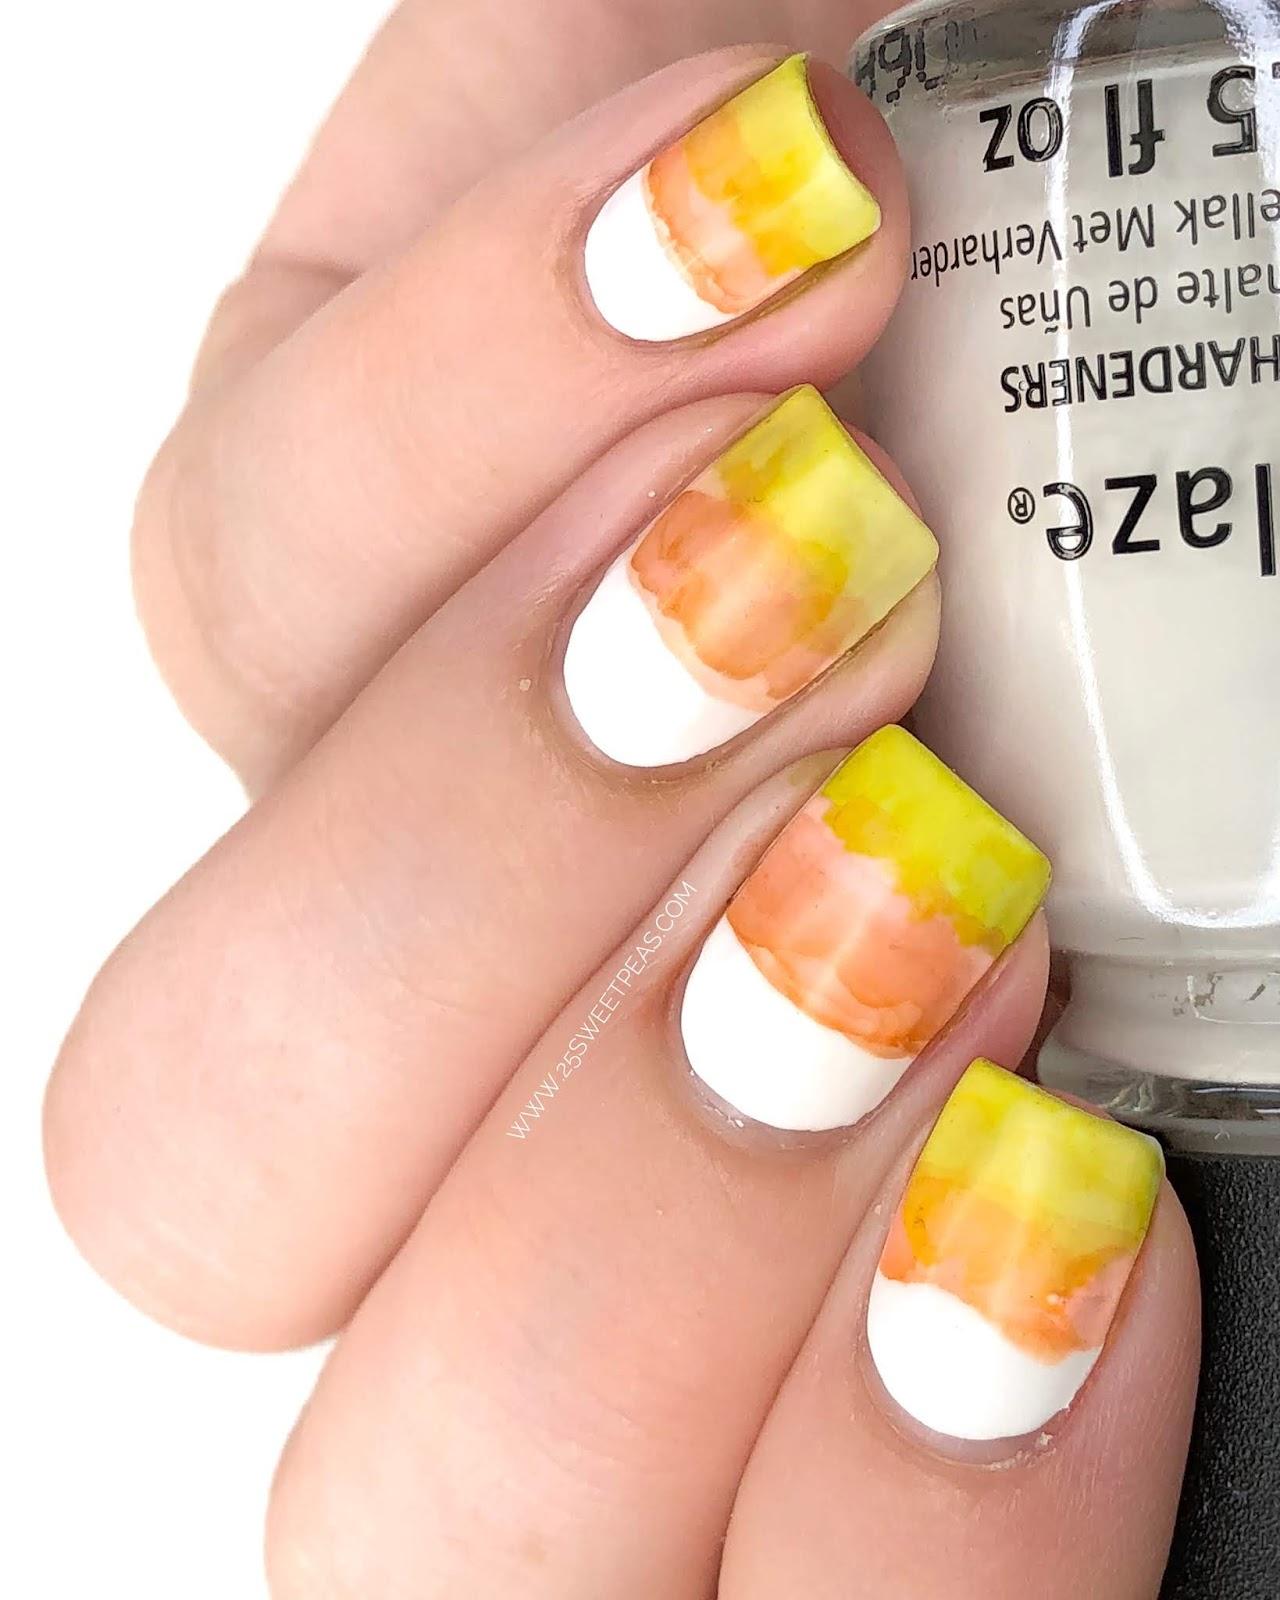 Easy Candy Corn Nail Art Using Sharpies - 25 Sweetpeas